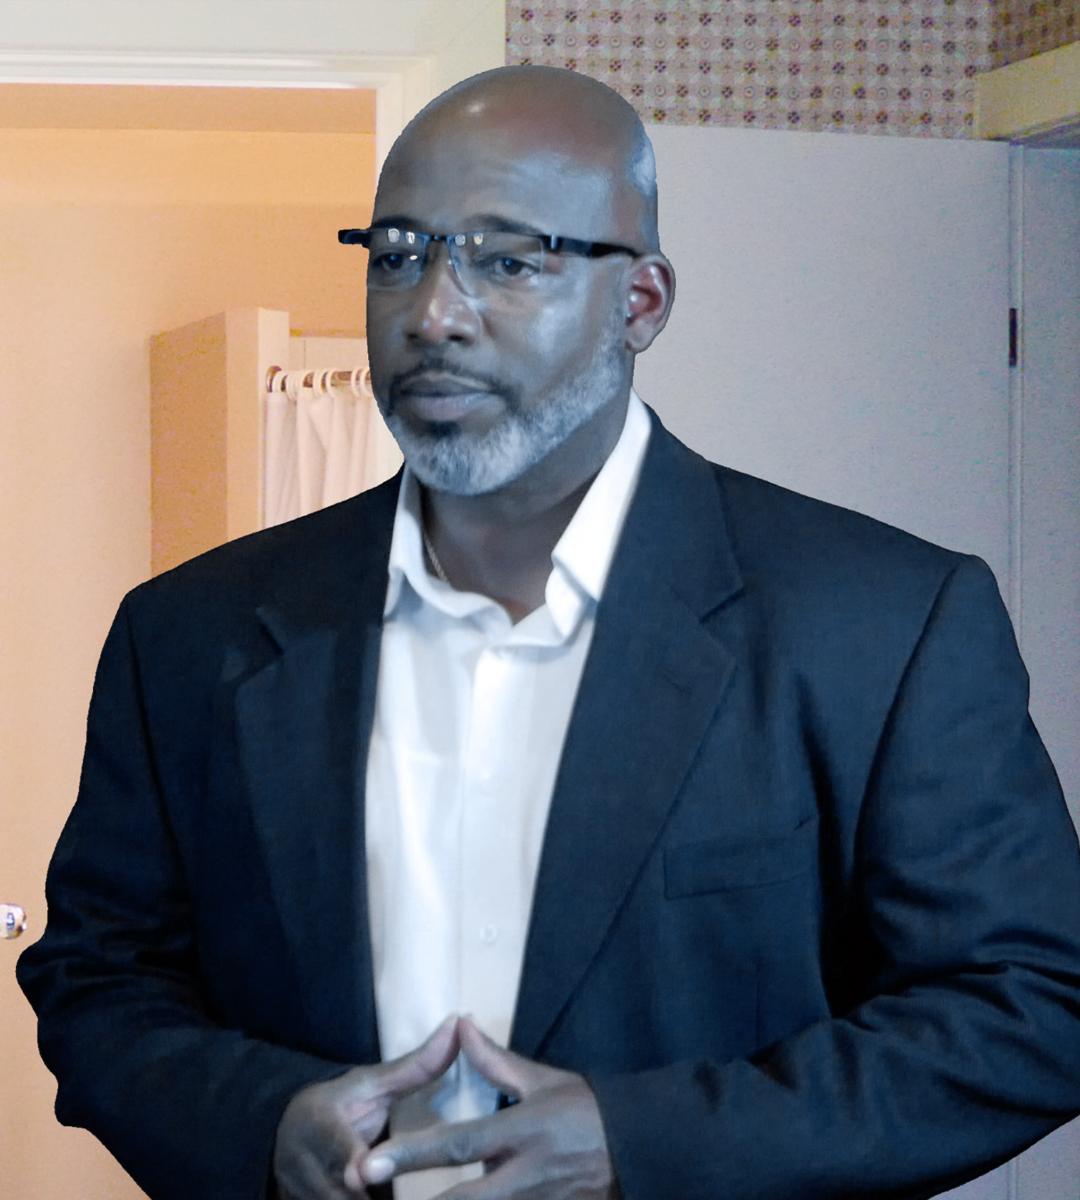 Pastor Stephens